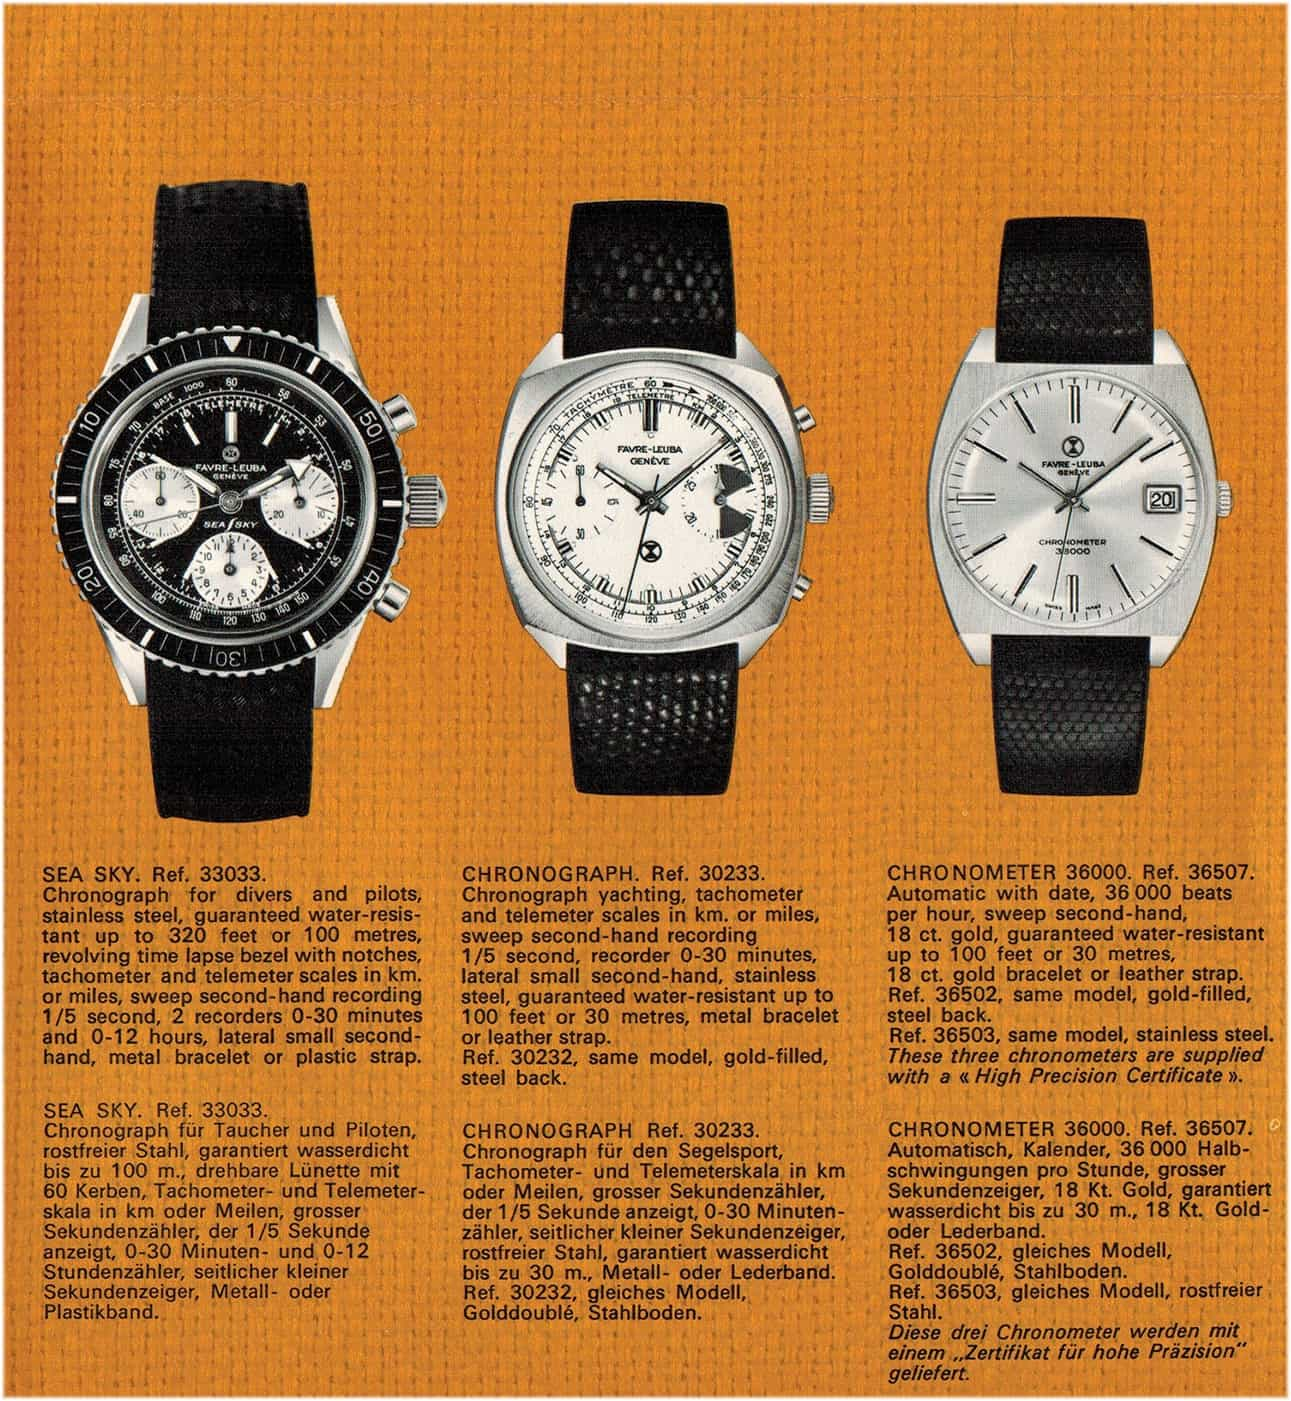 Sea Sky, Chronograph, Chronometer von 1968